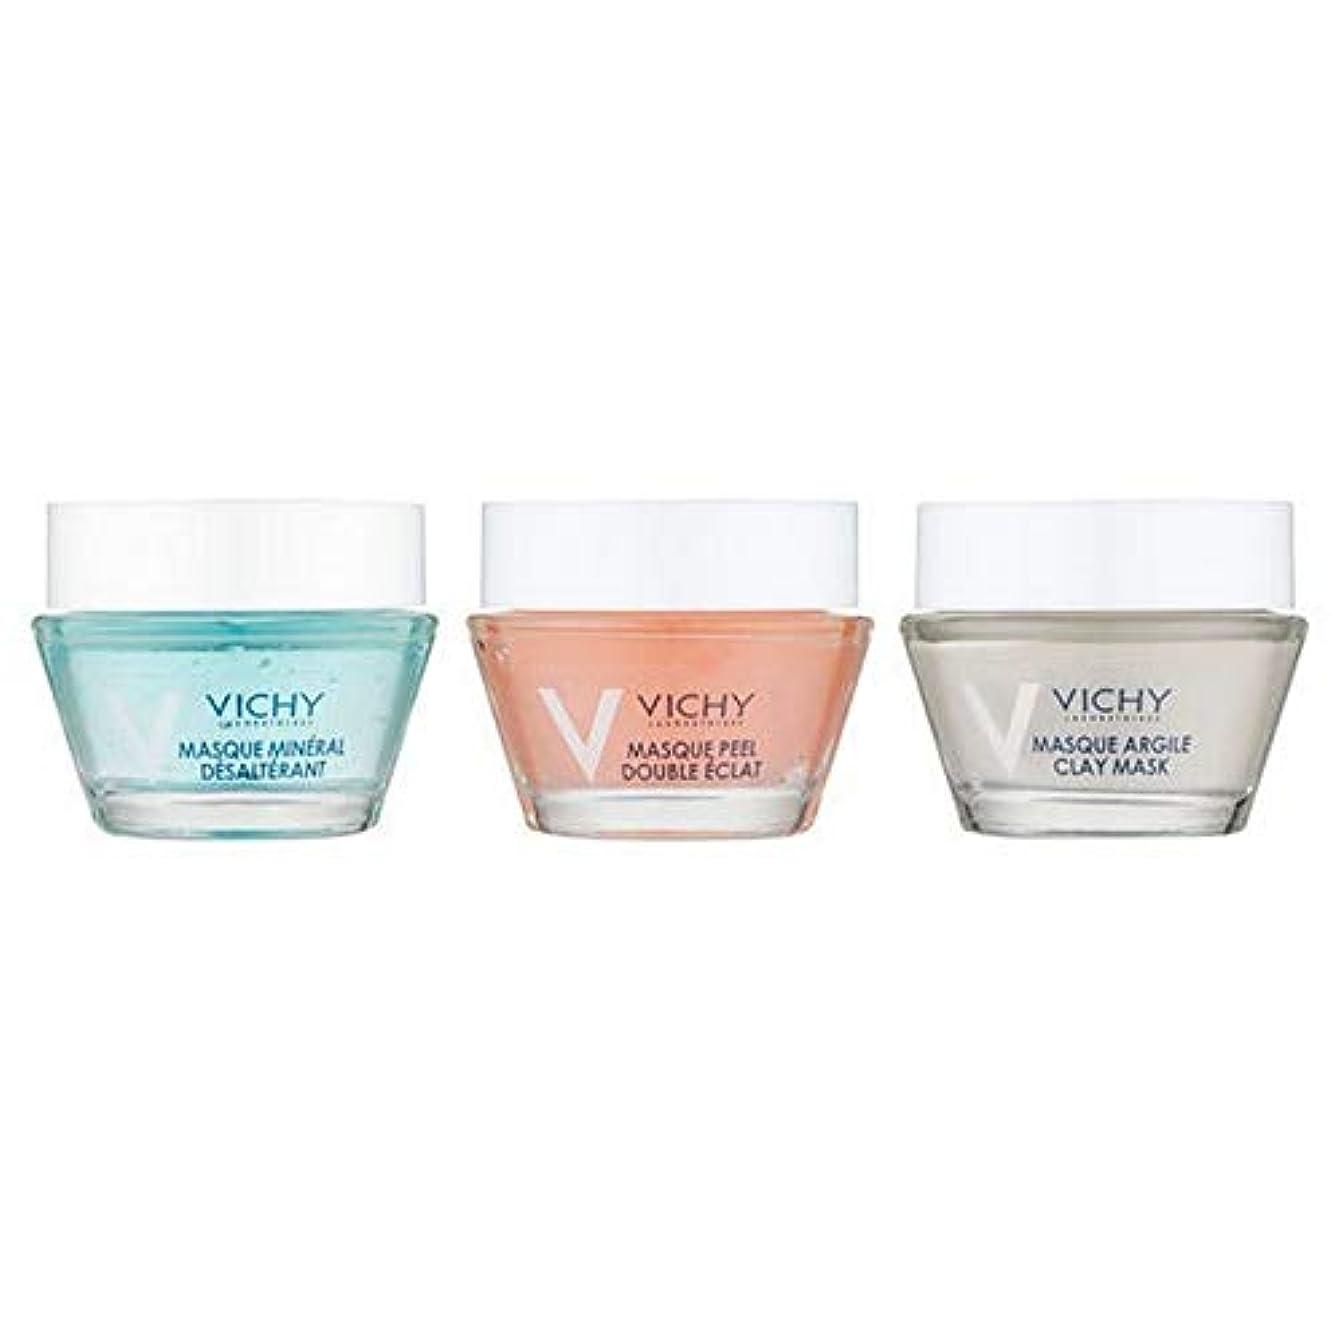 [Vichy] ヴィシーPuret?熱ミニミネラルマスクキット3×15ミリリットル - Vichy Puret? Thermal Mini Mineral Mask Kit 3 x 15ml [並行輸入品]